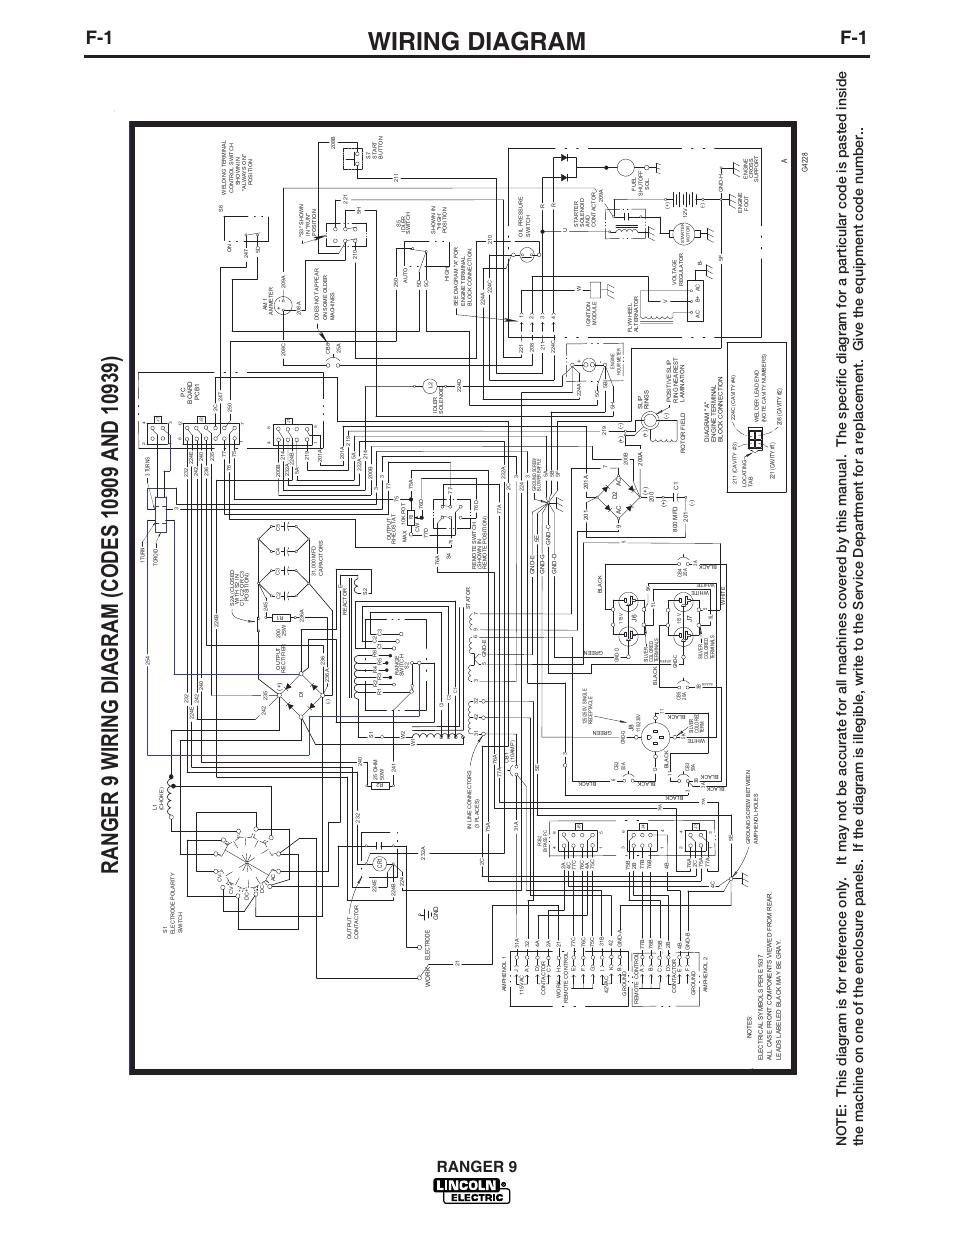 lincoln ranger 9 wiring diagram